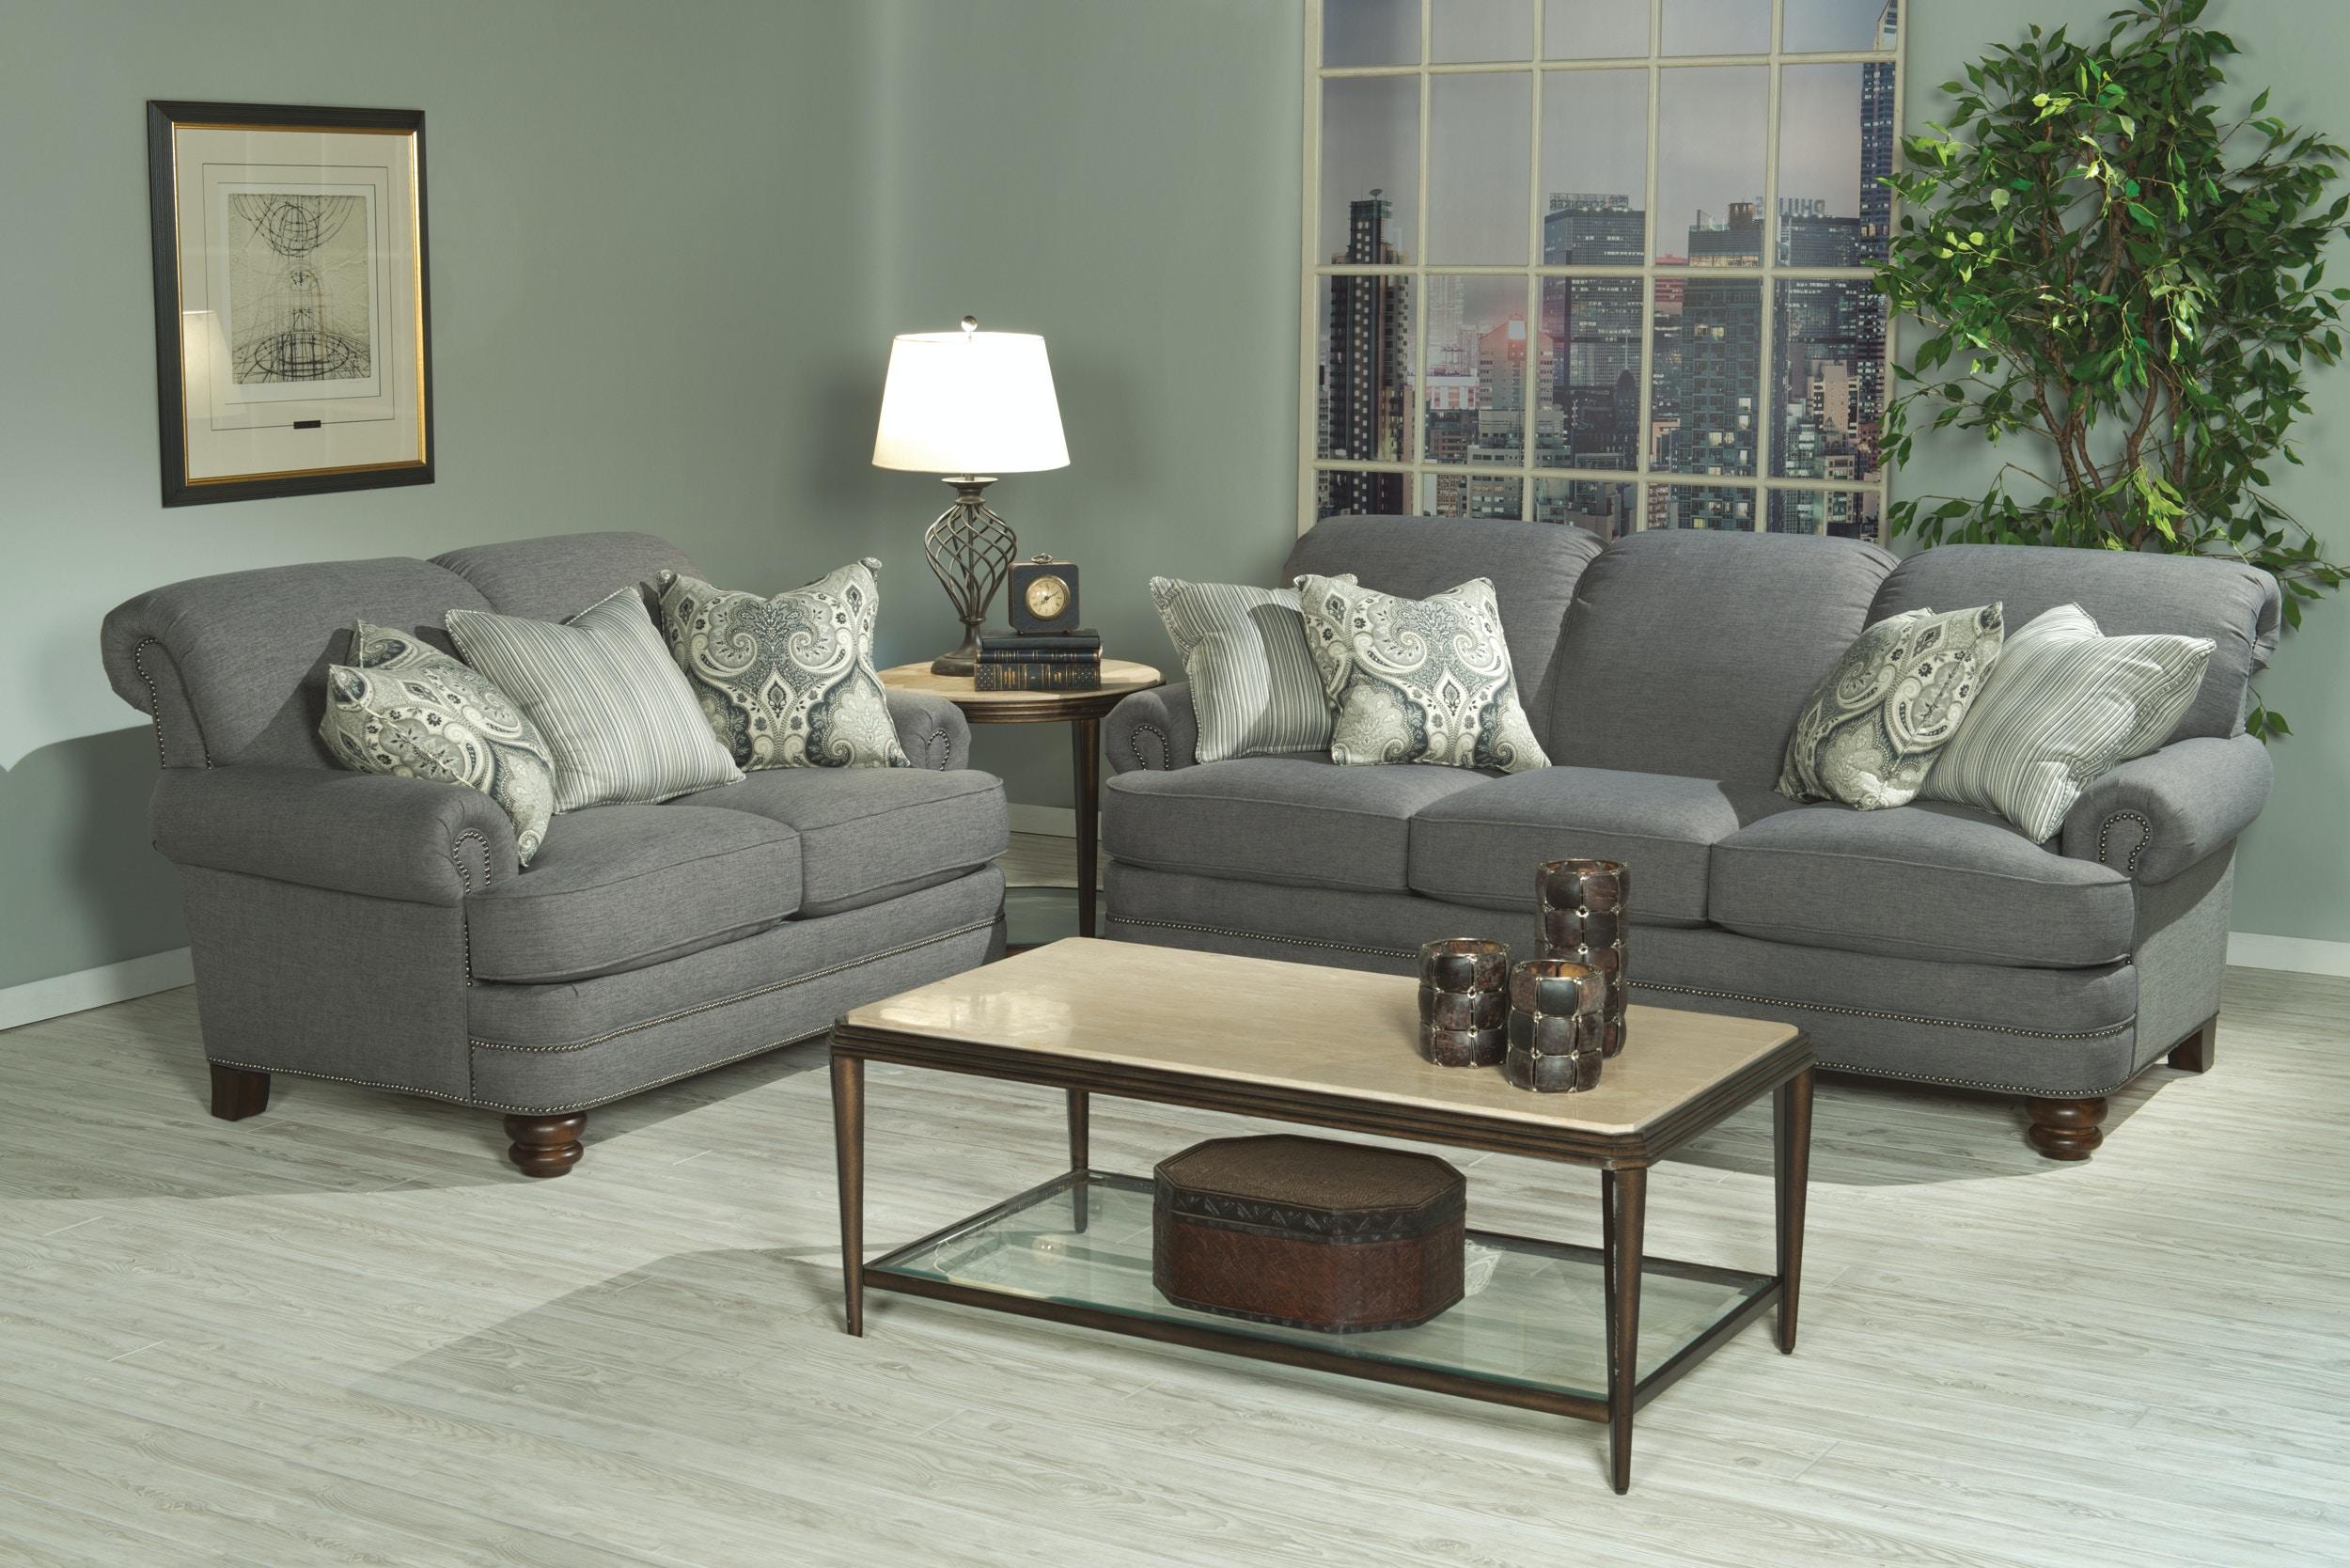 flexsteel sofa with pillows - Flexsteel Sofas